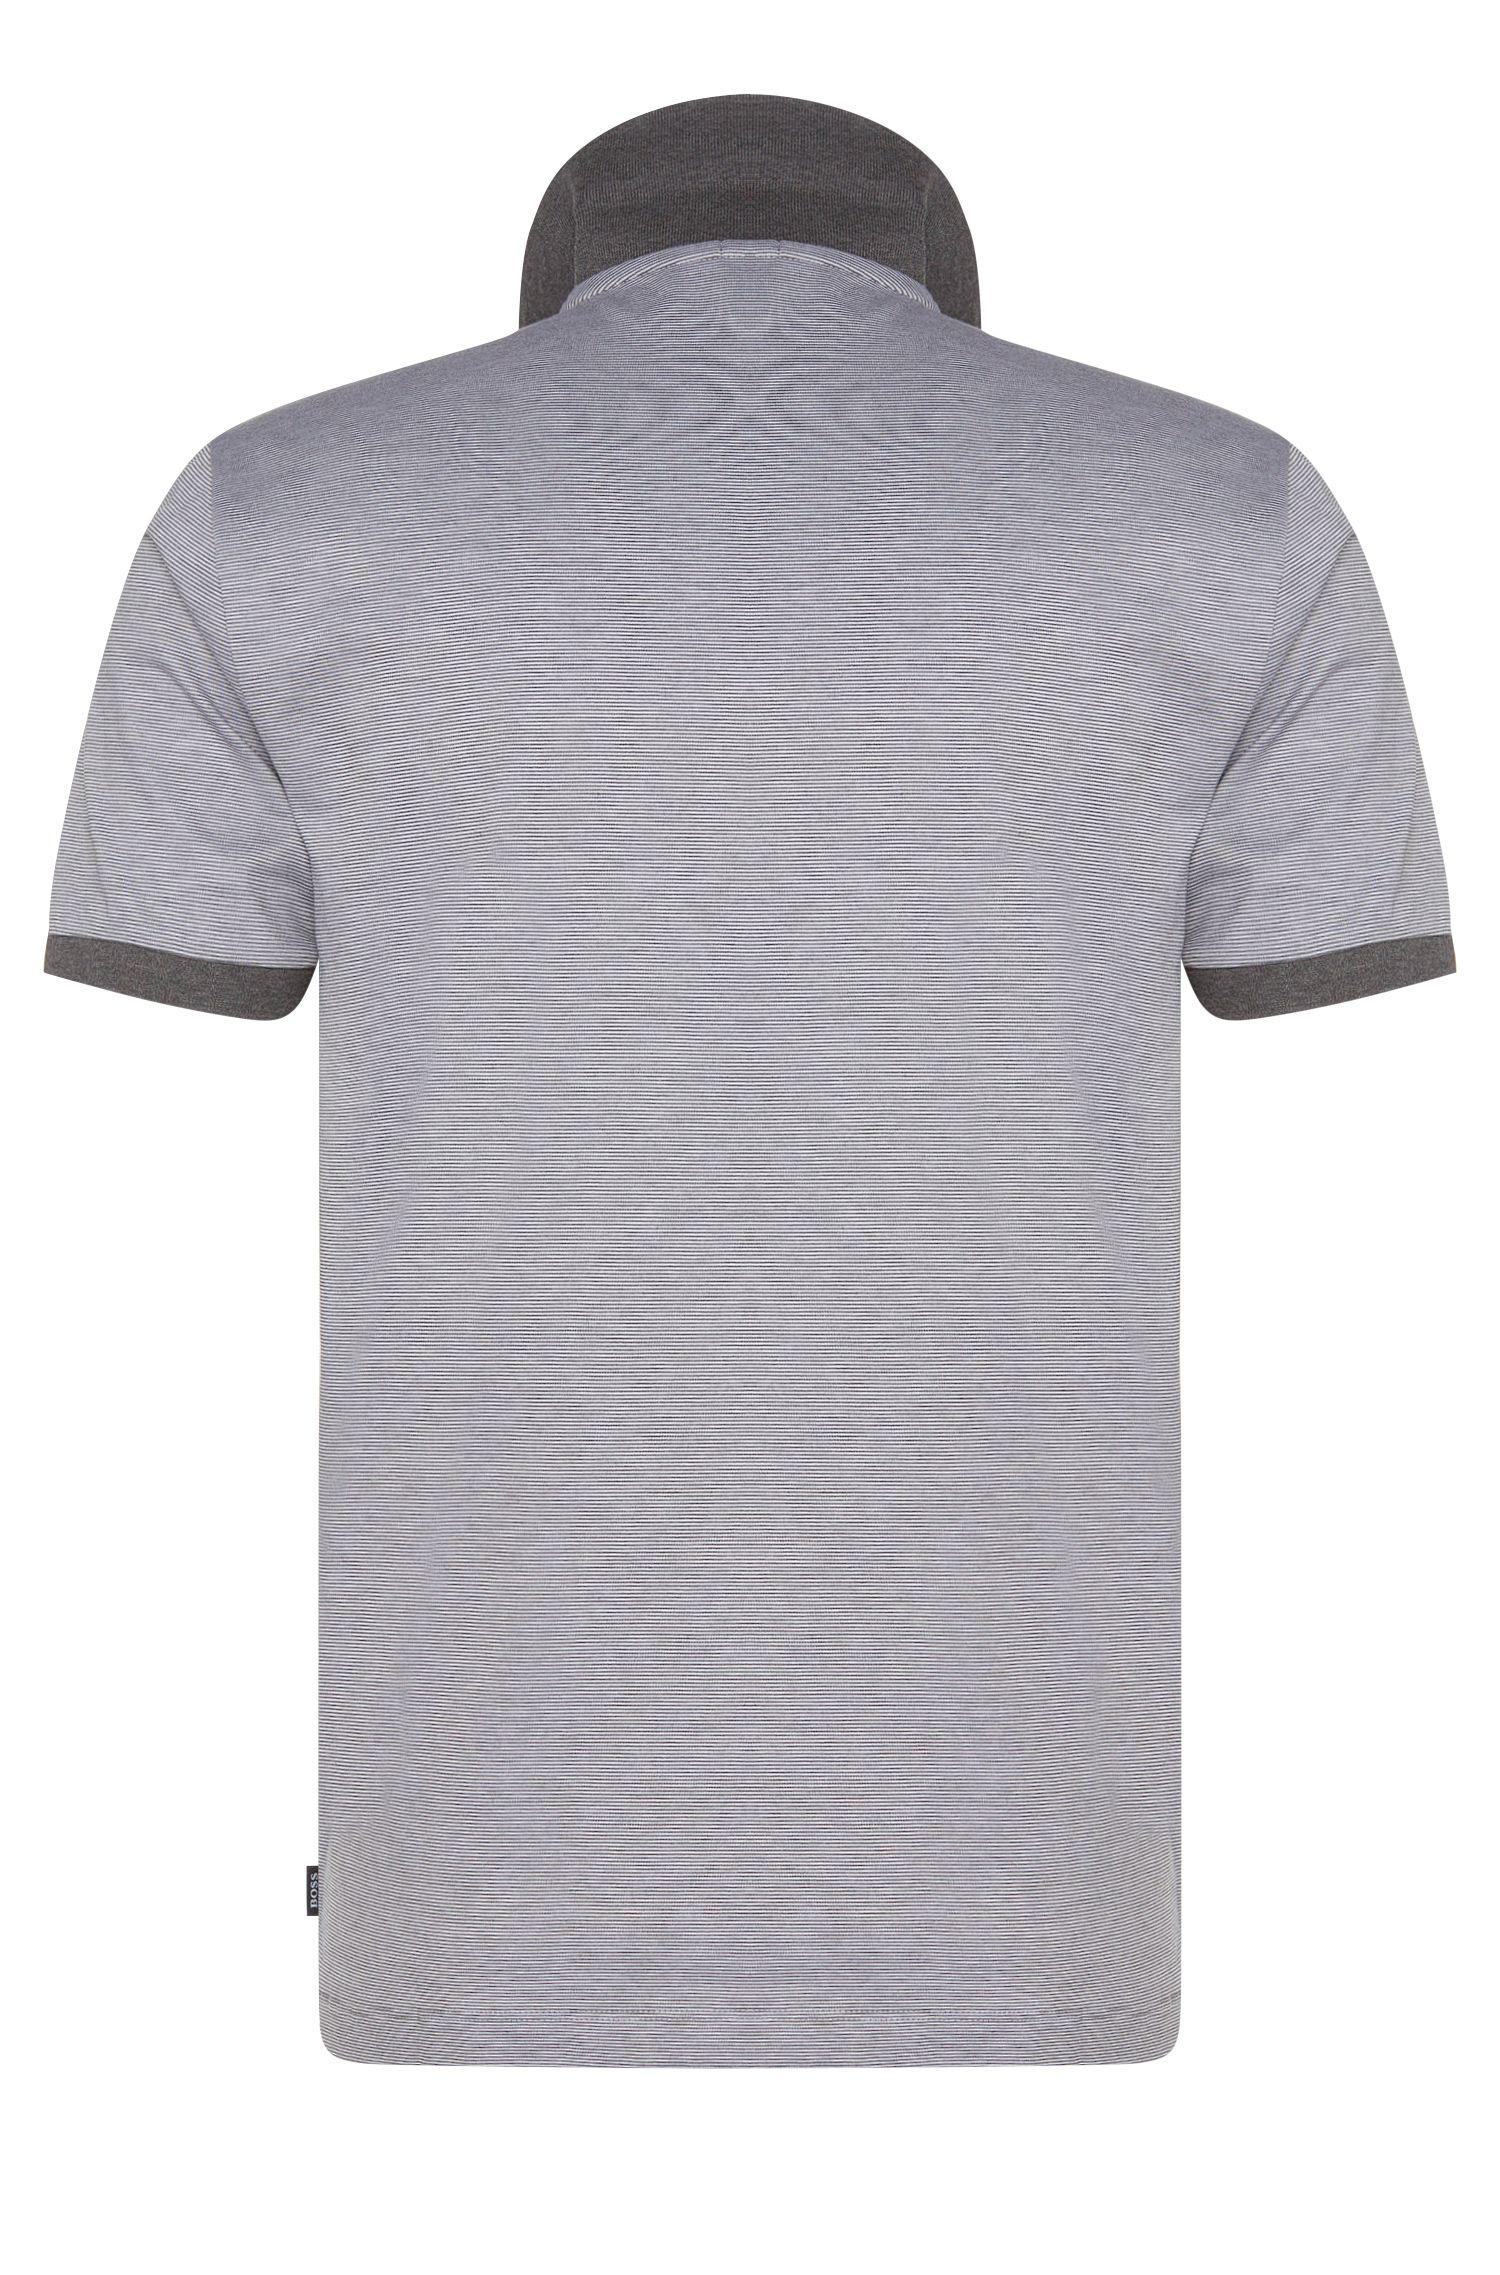 Gestreiftes Slim-Fit Poloshirt aus Baumwolle: 'Penrose 05'